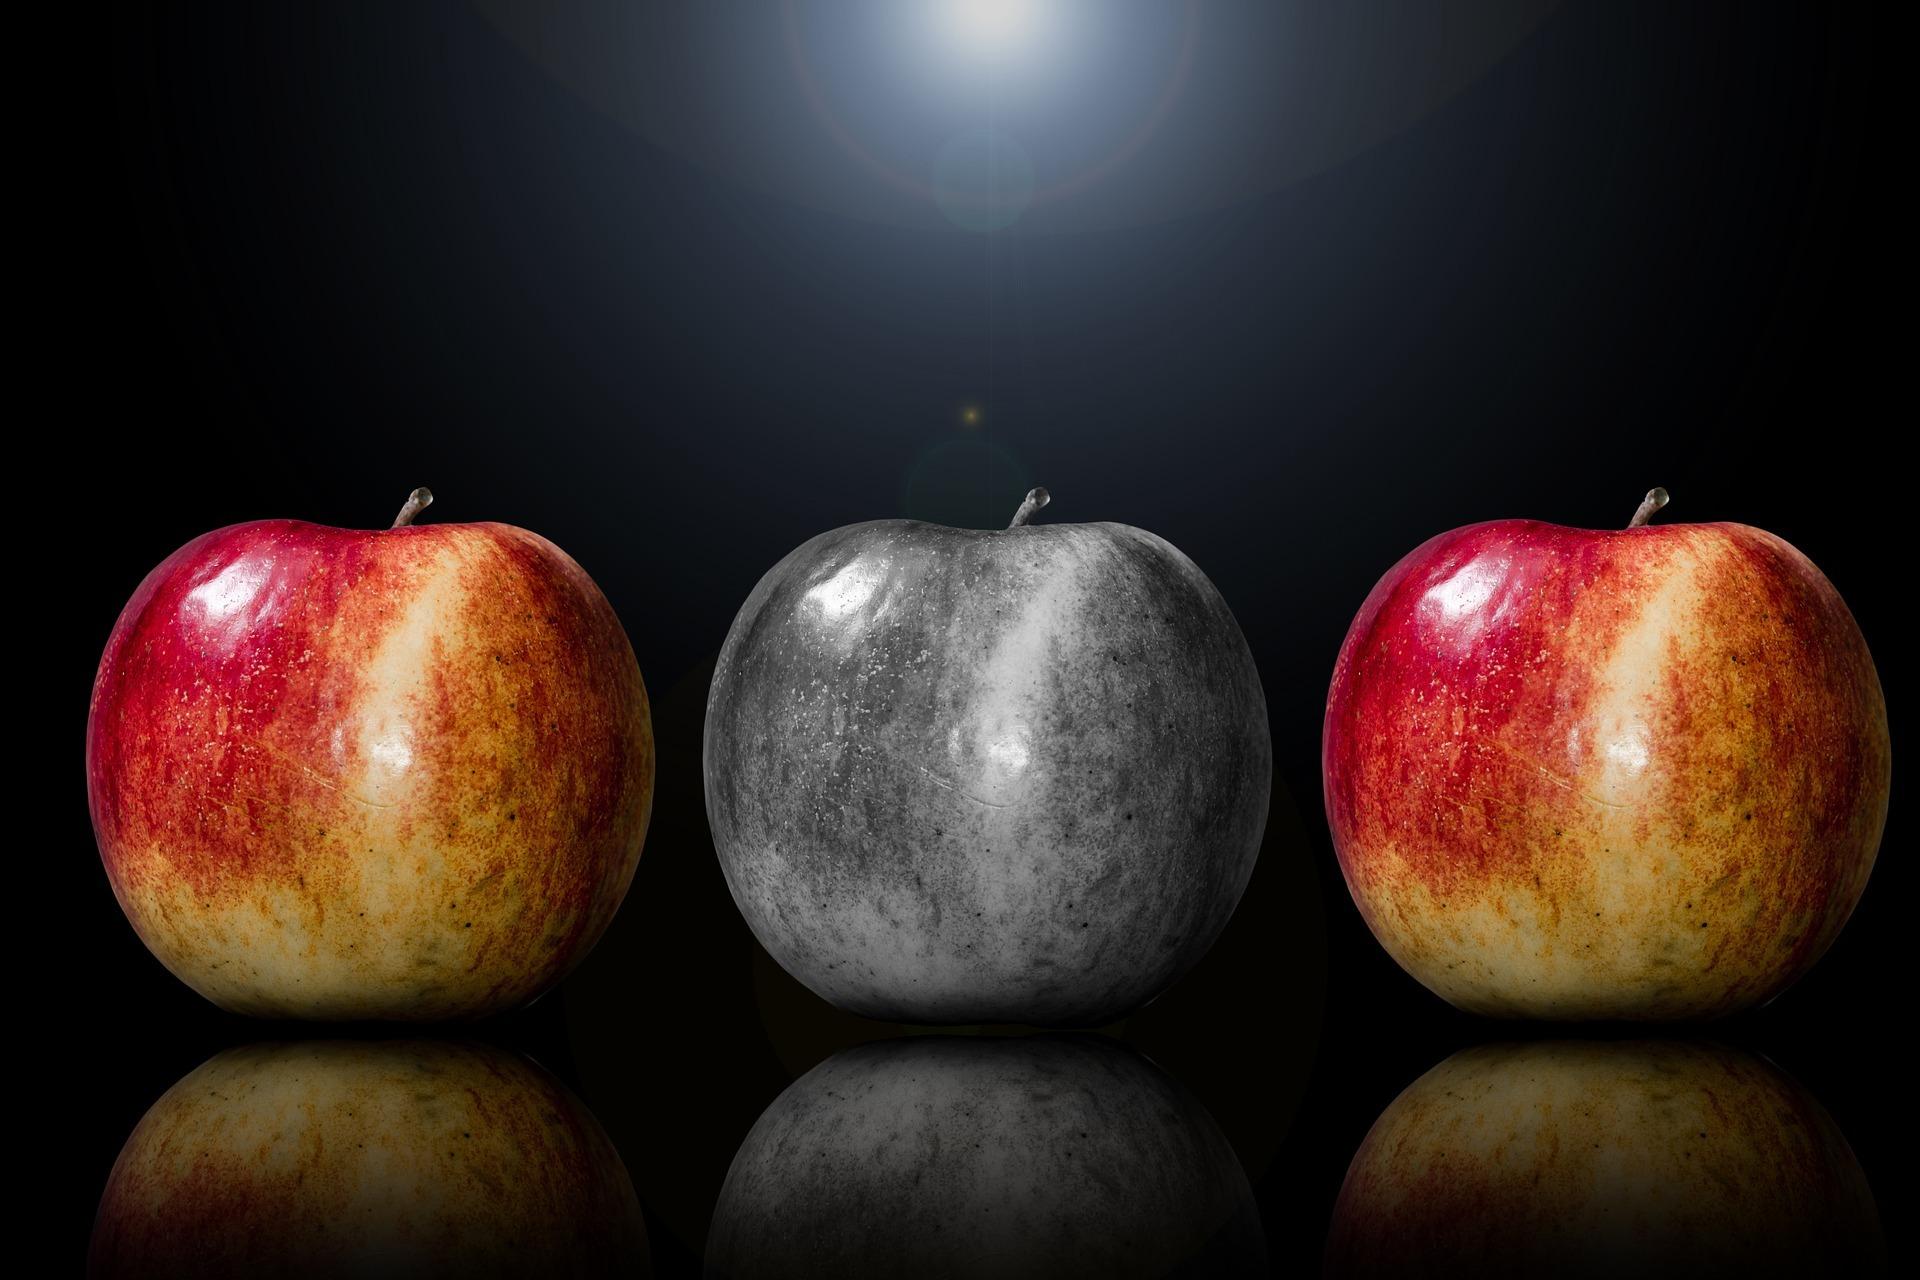 apple-1632919_1920.jpg